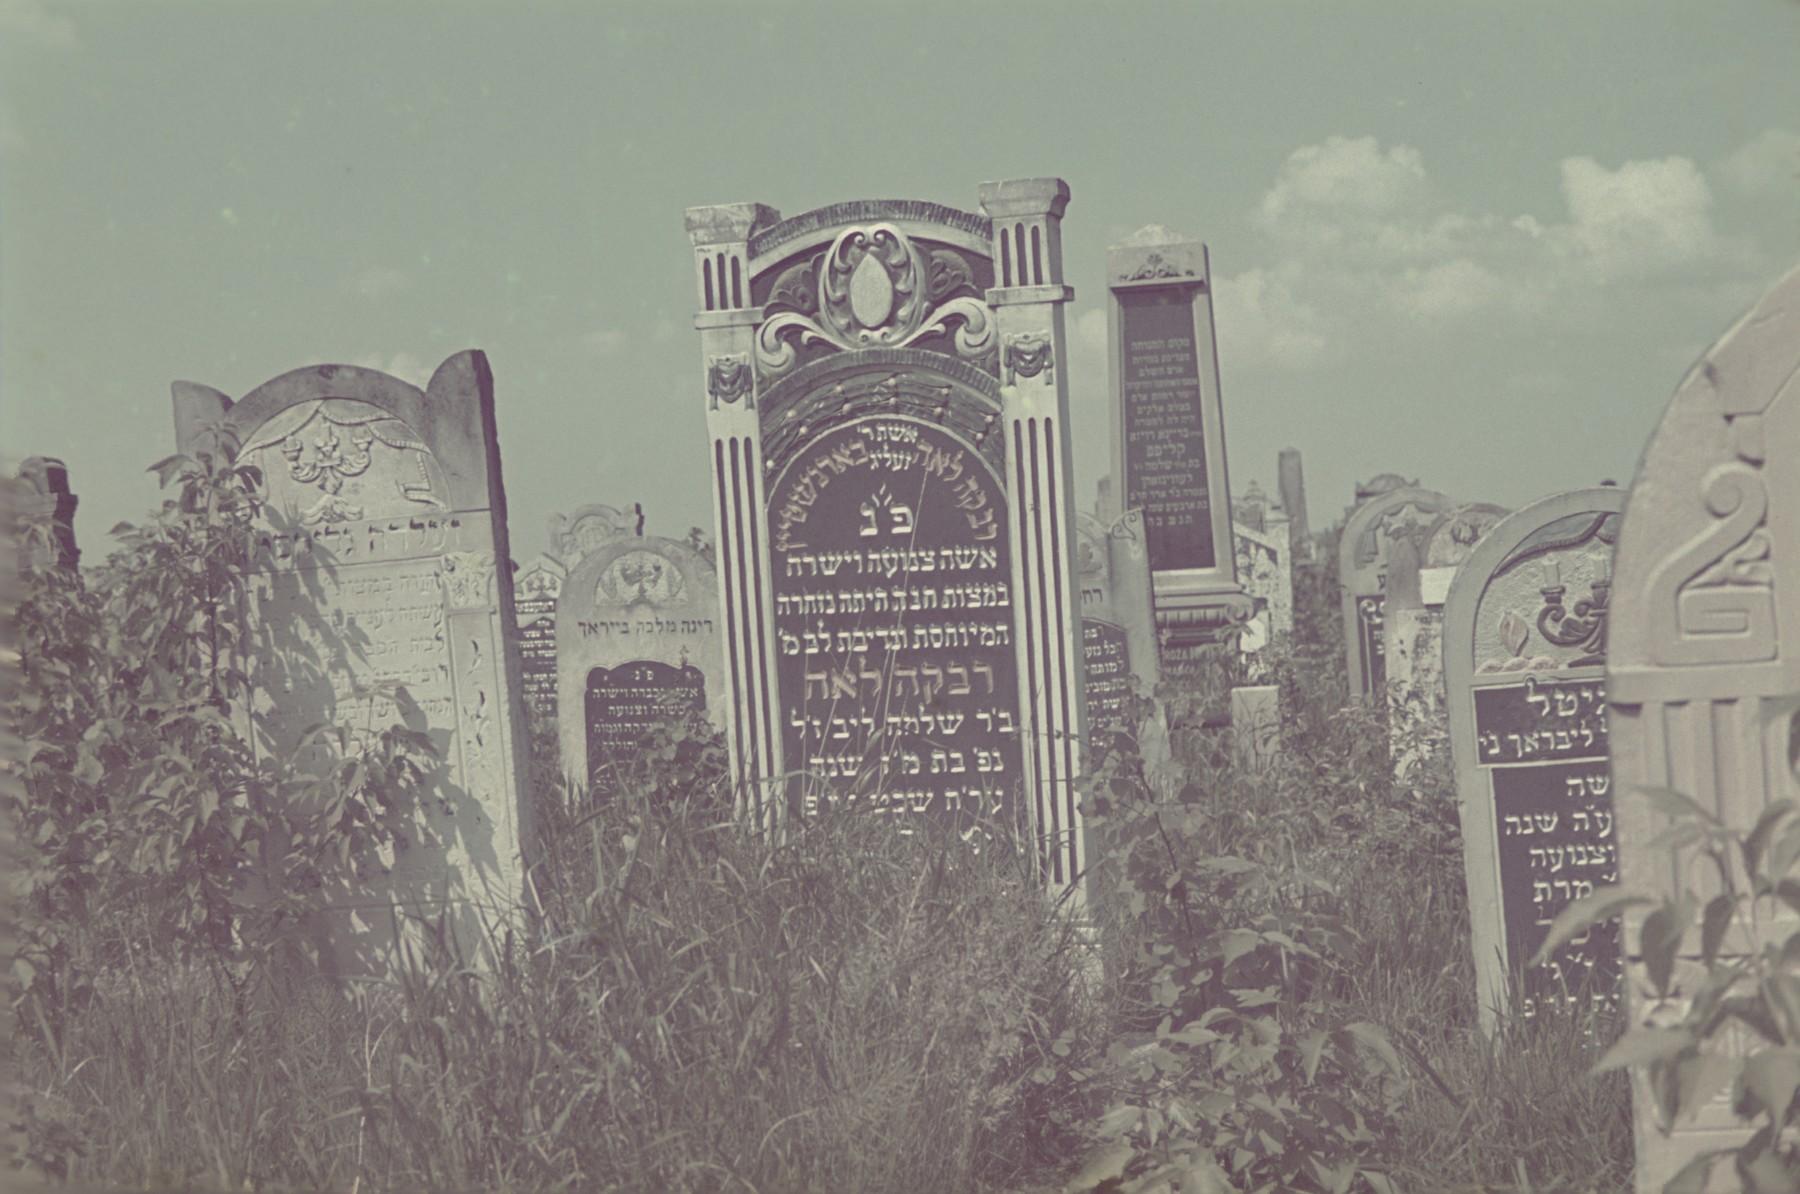 Tombstones in the Lodz ghetto cemetery.